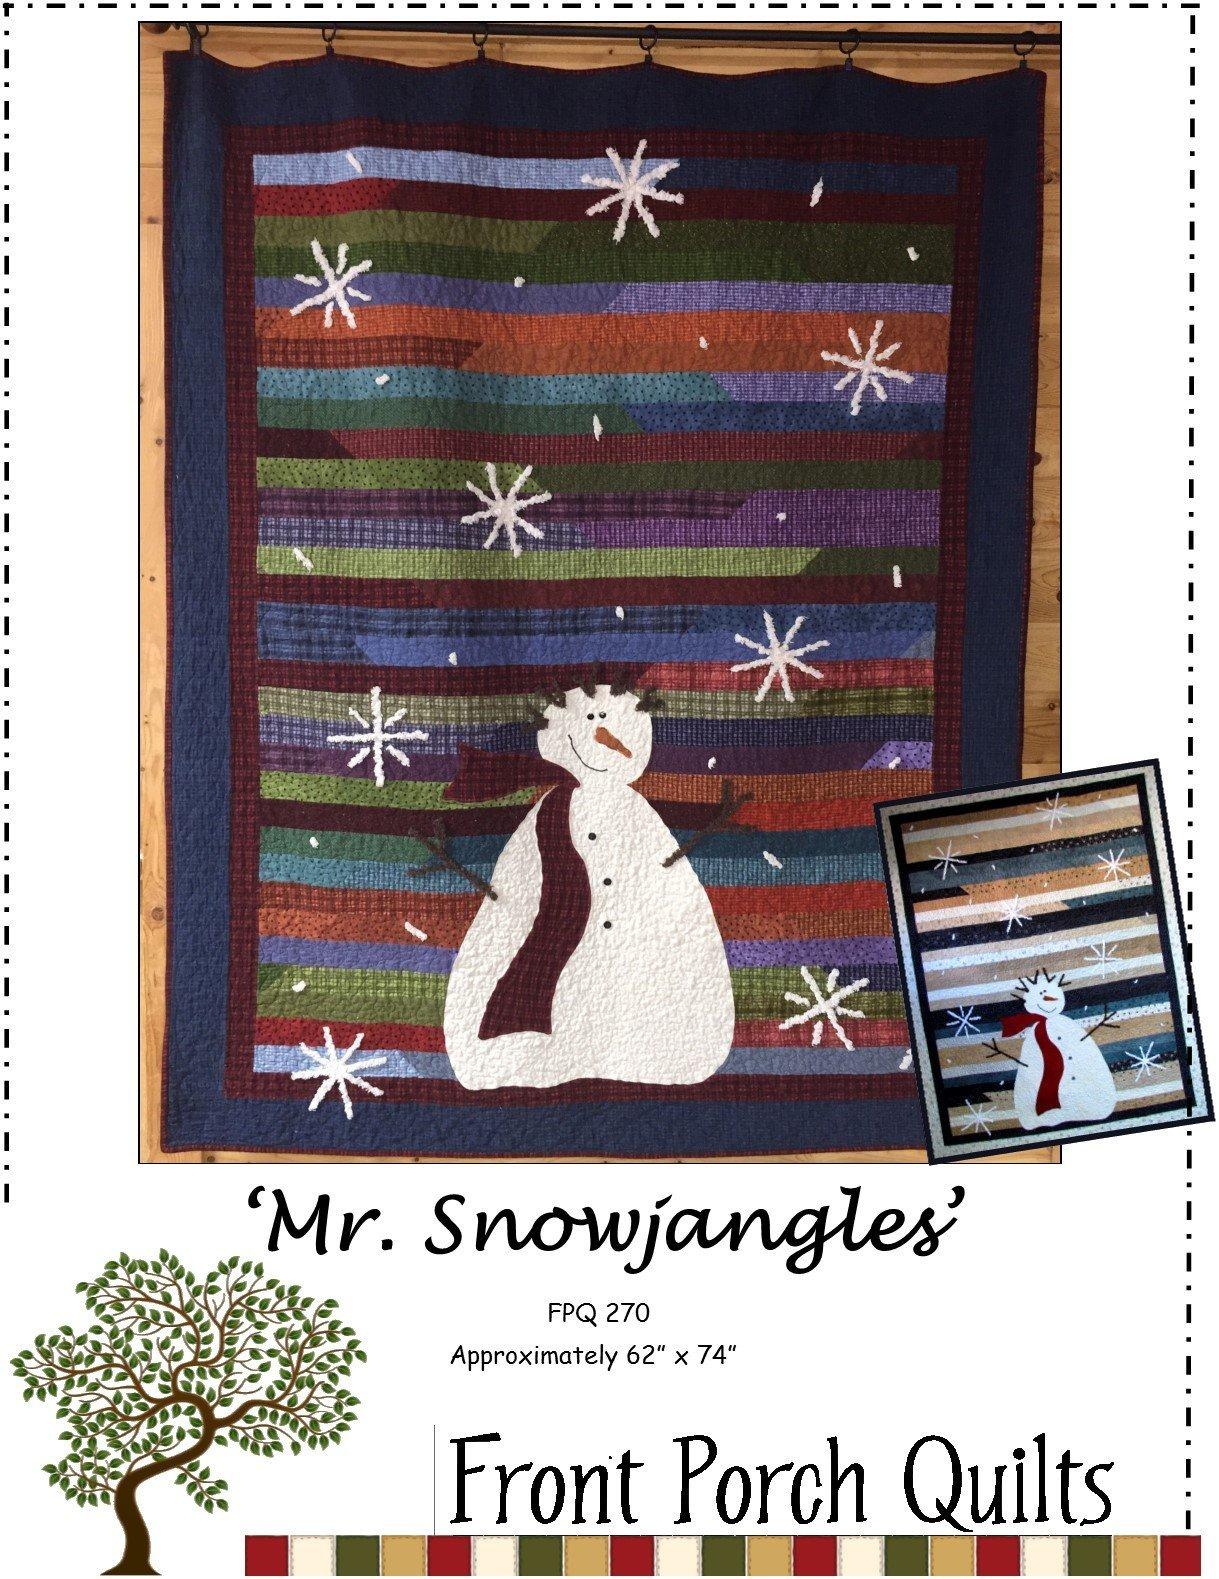 Mr. Snowjangles Kit